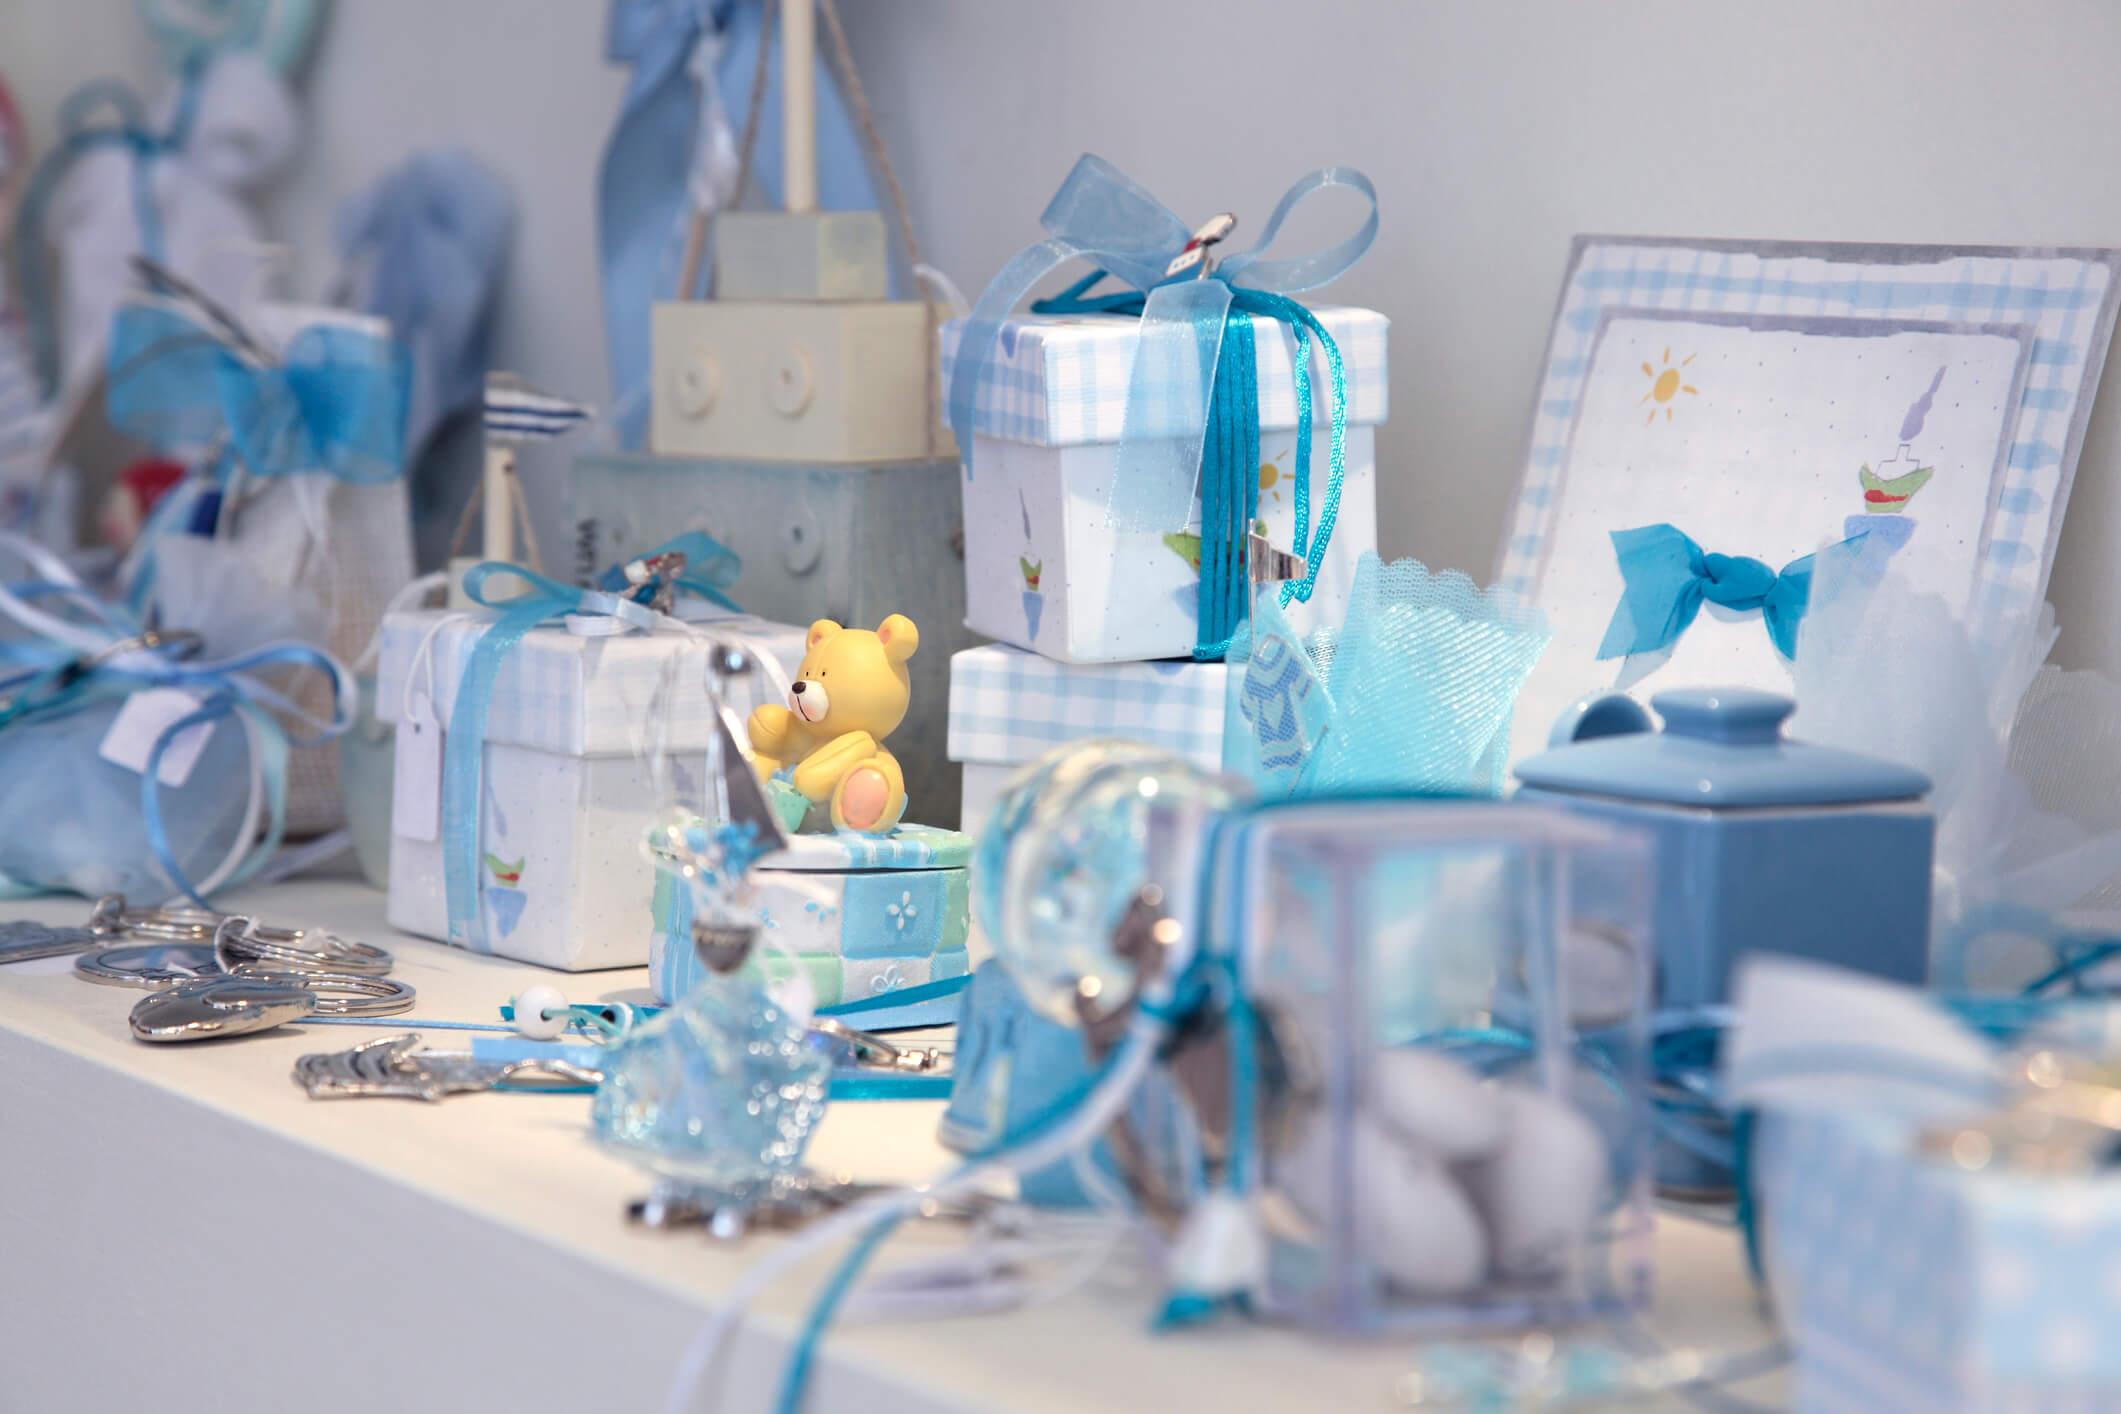 Chá de bebê: aprenda como organizar de forma eficiente